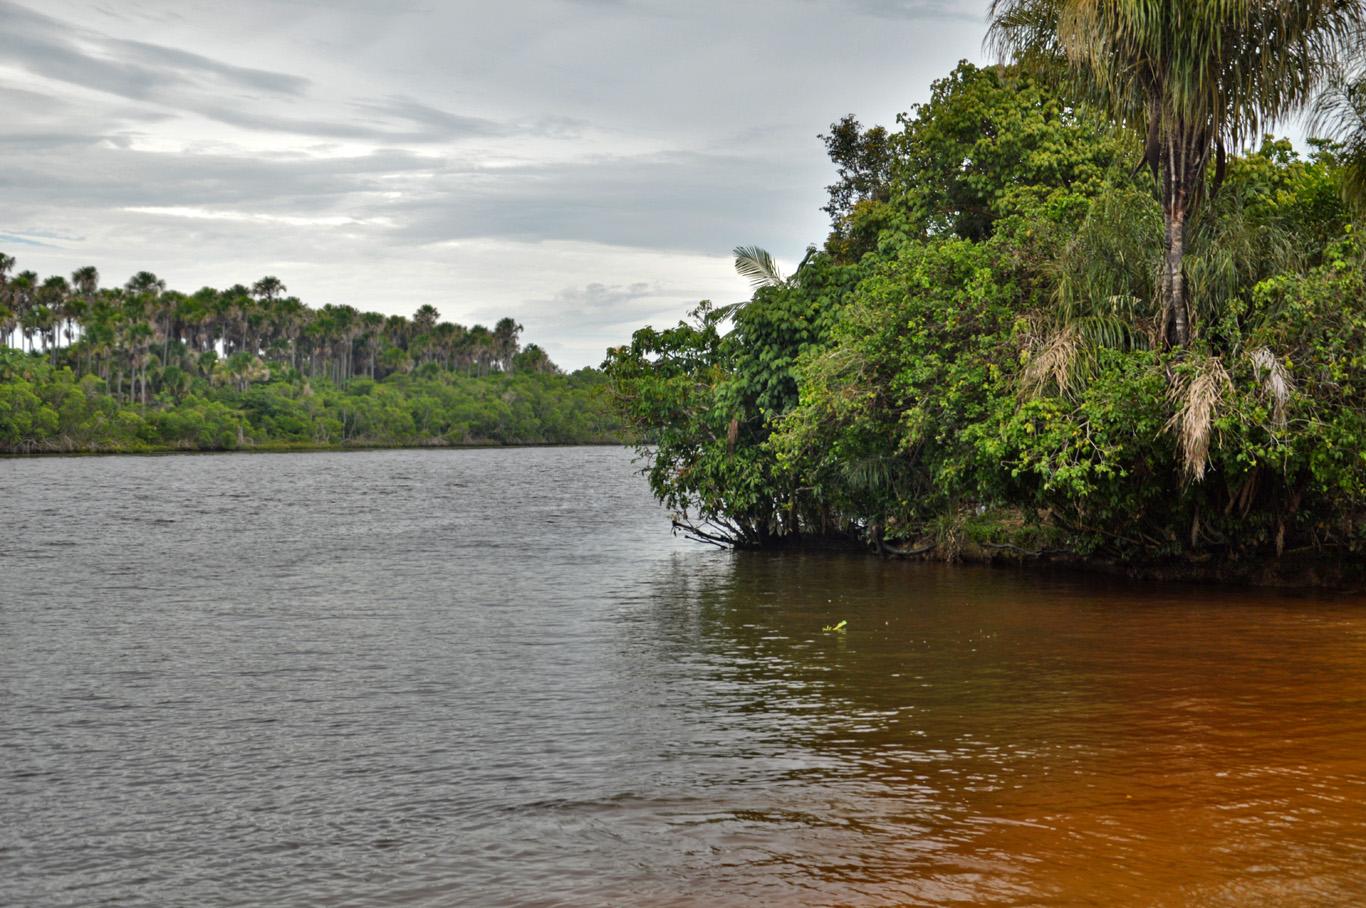 River Preguica and the rainforest